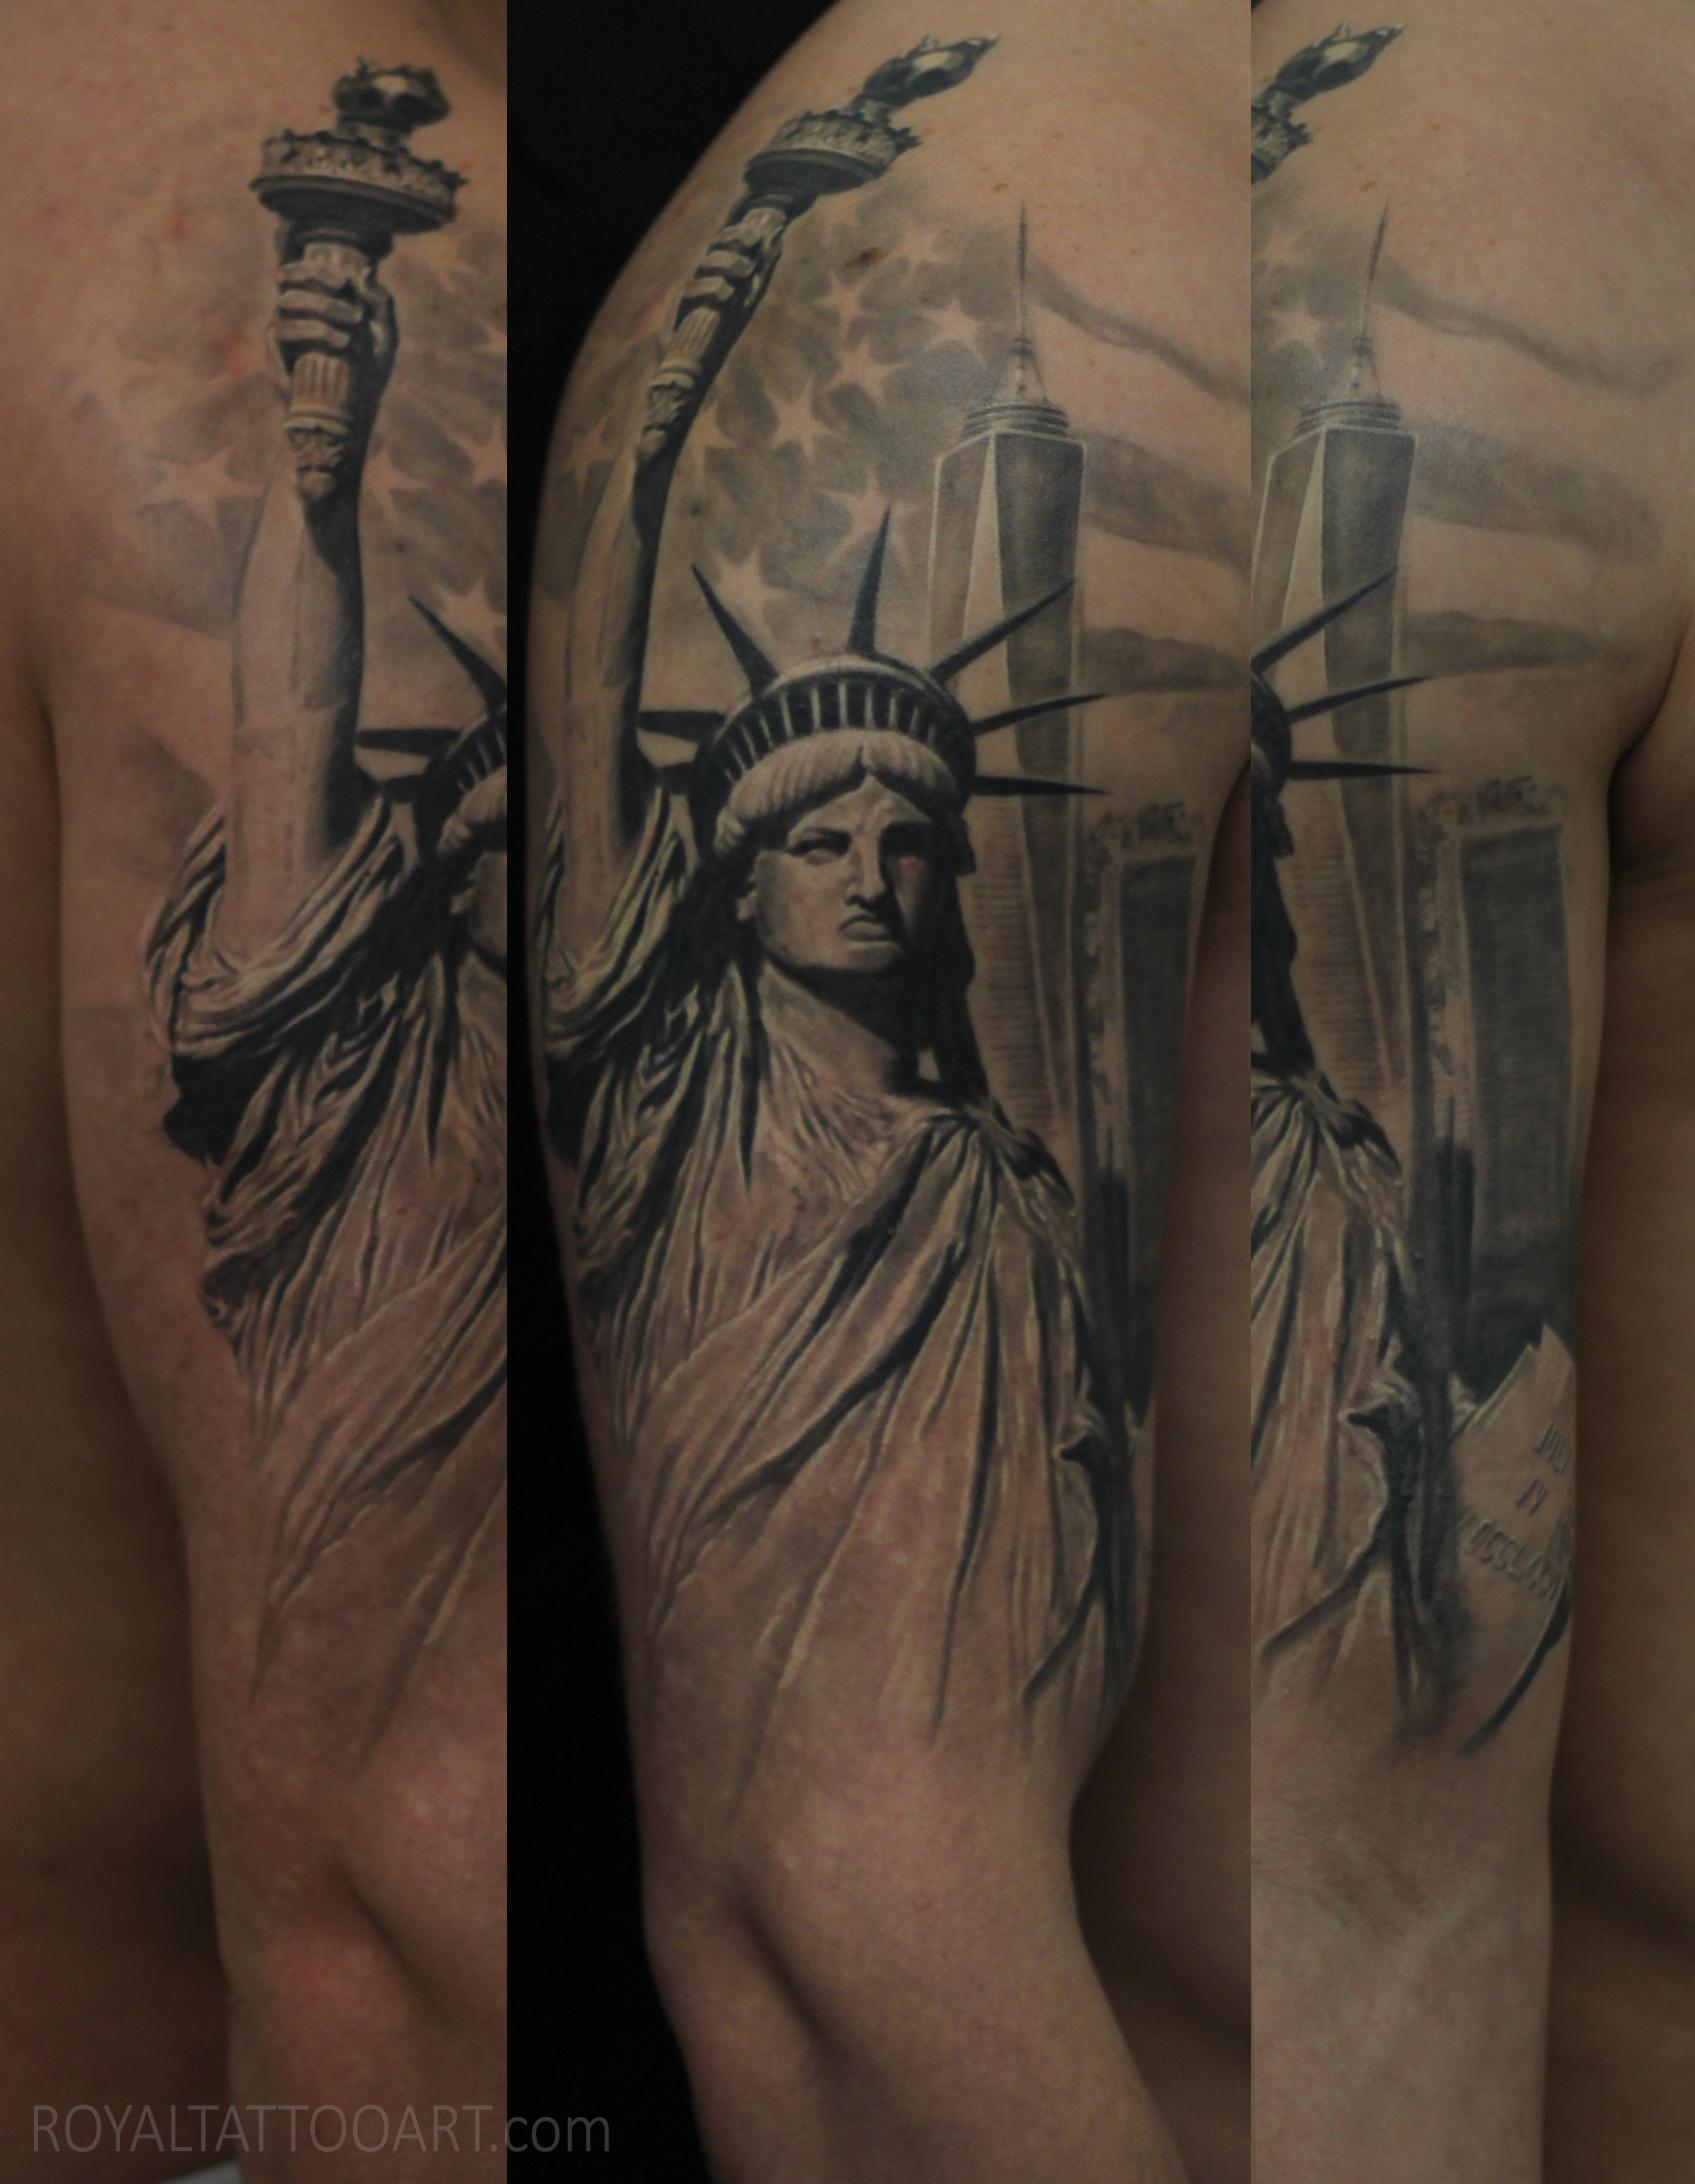 statue liberty nyc freedom tower american flag manhattan tattoo black and grey realism realistic photo realistic royal tattoo art.jpg